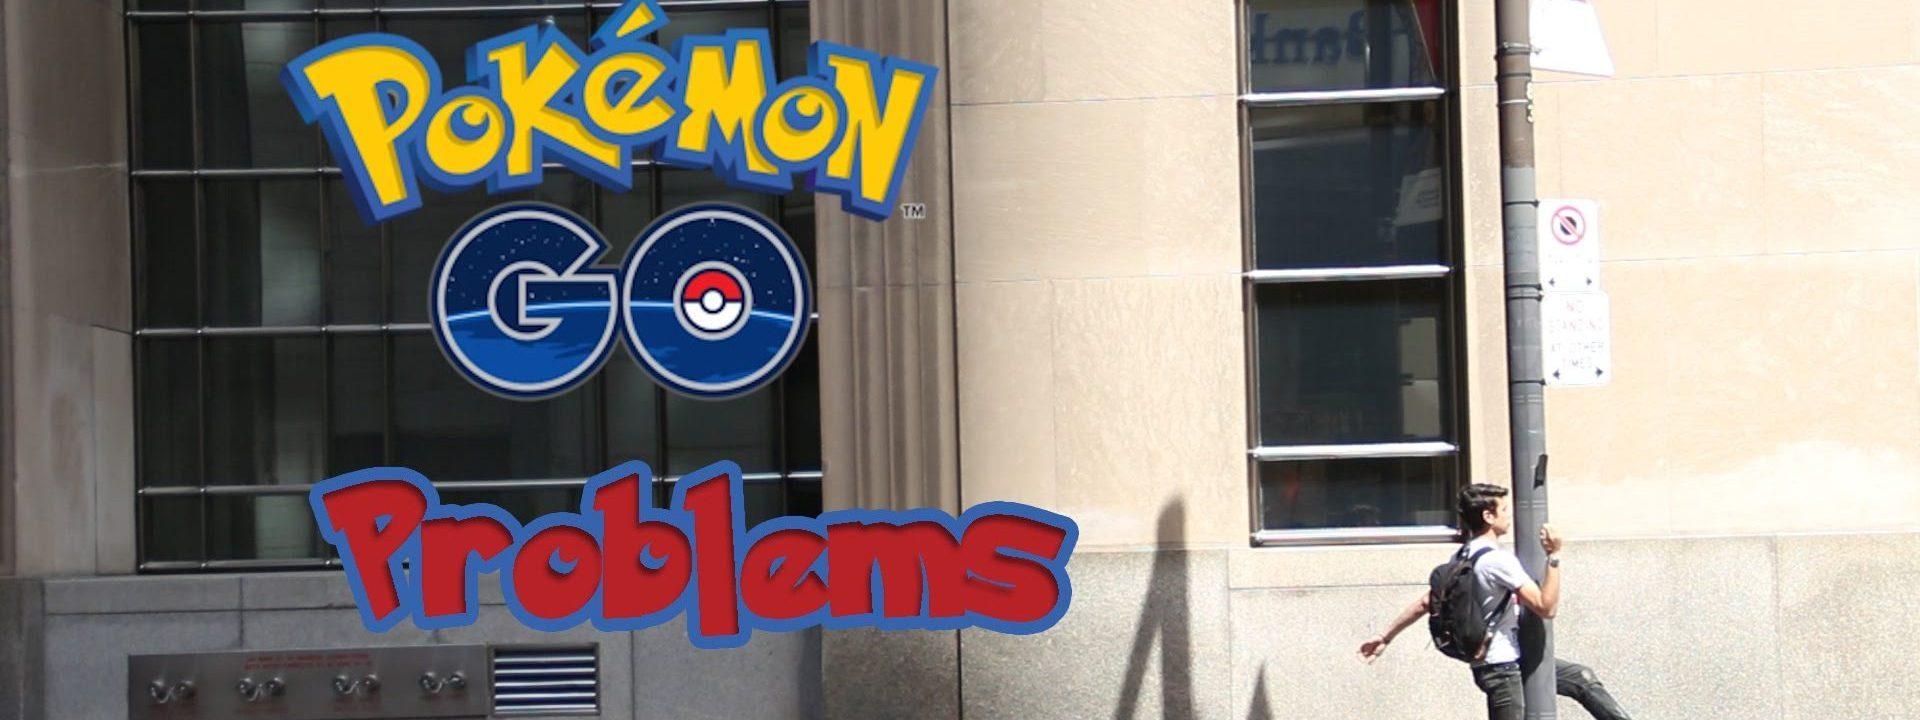 The Problem with Pokemon Go